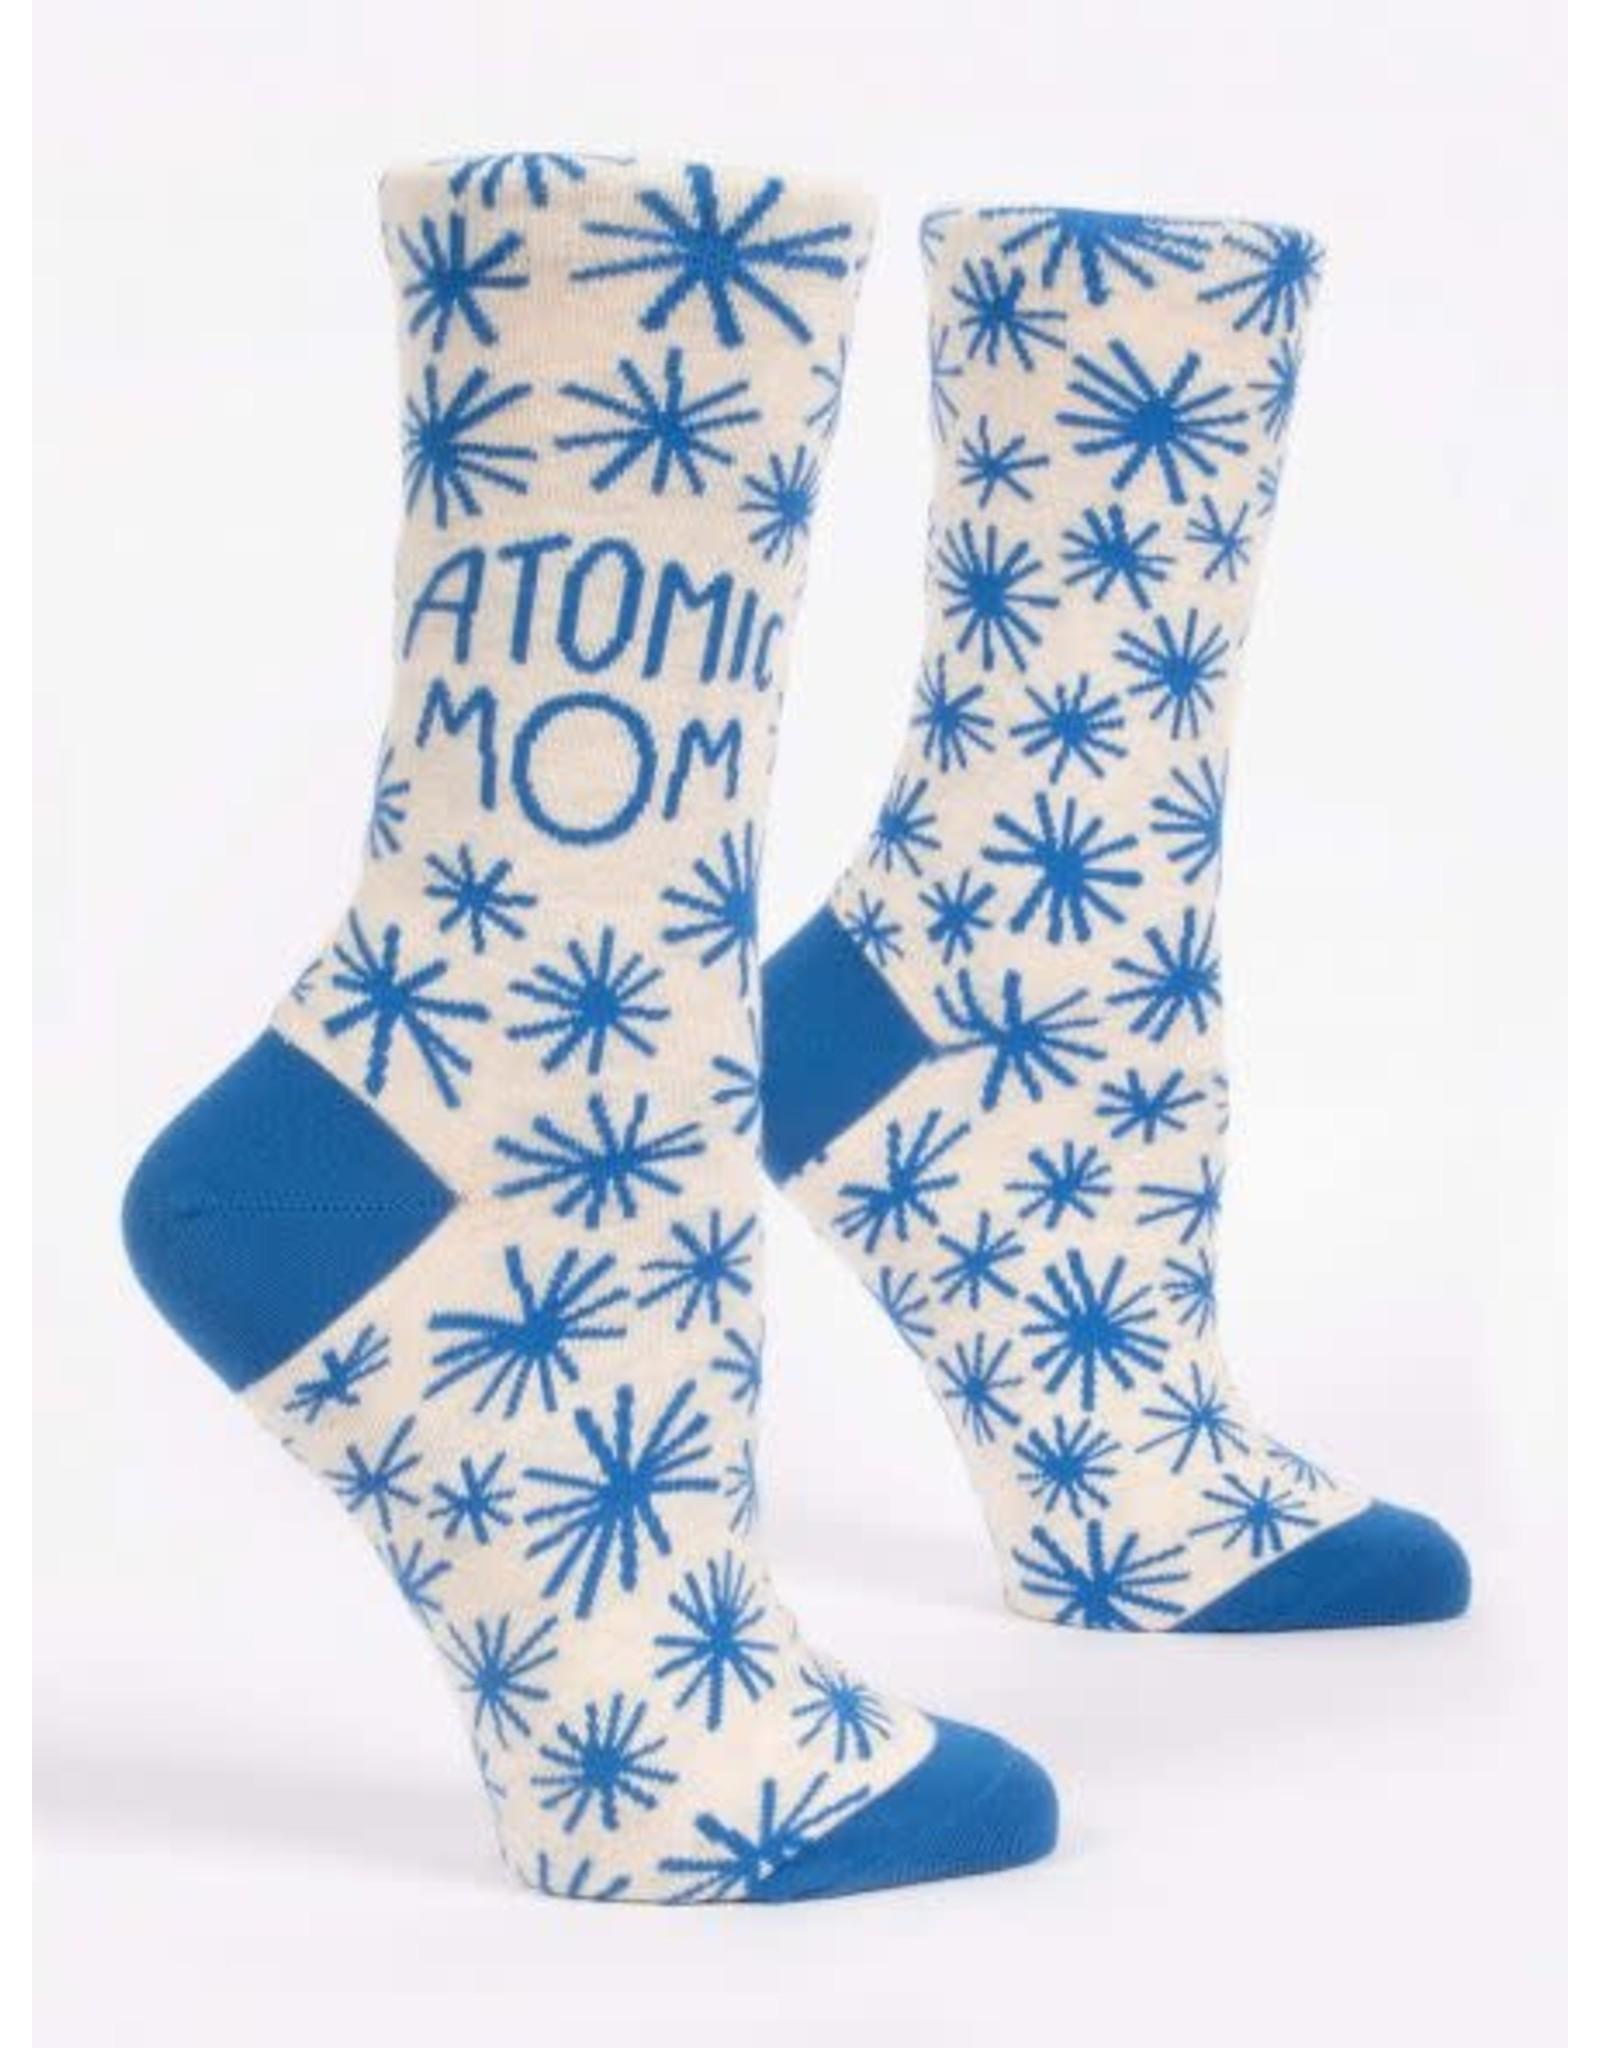 BQ Sassy Socks - Atomic Mom